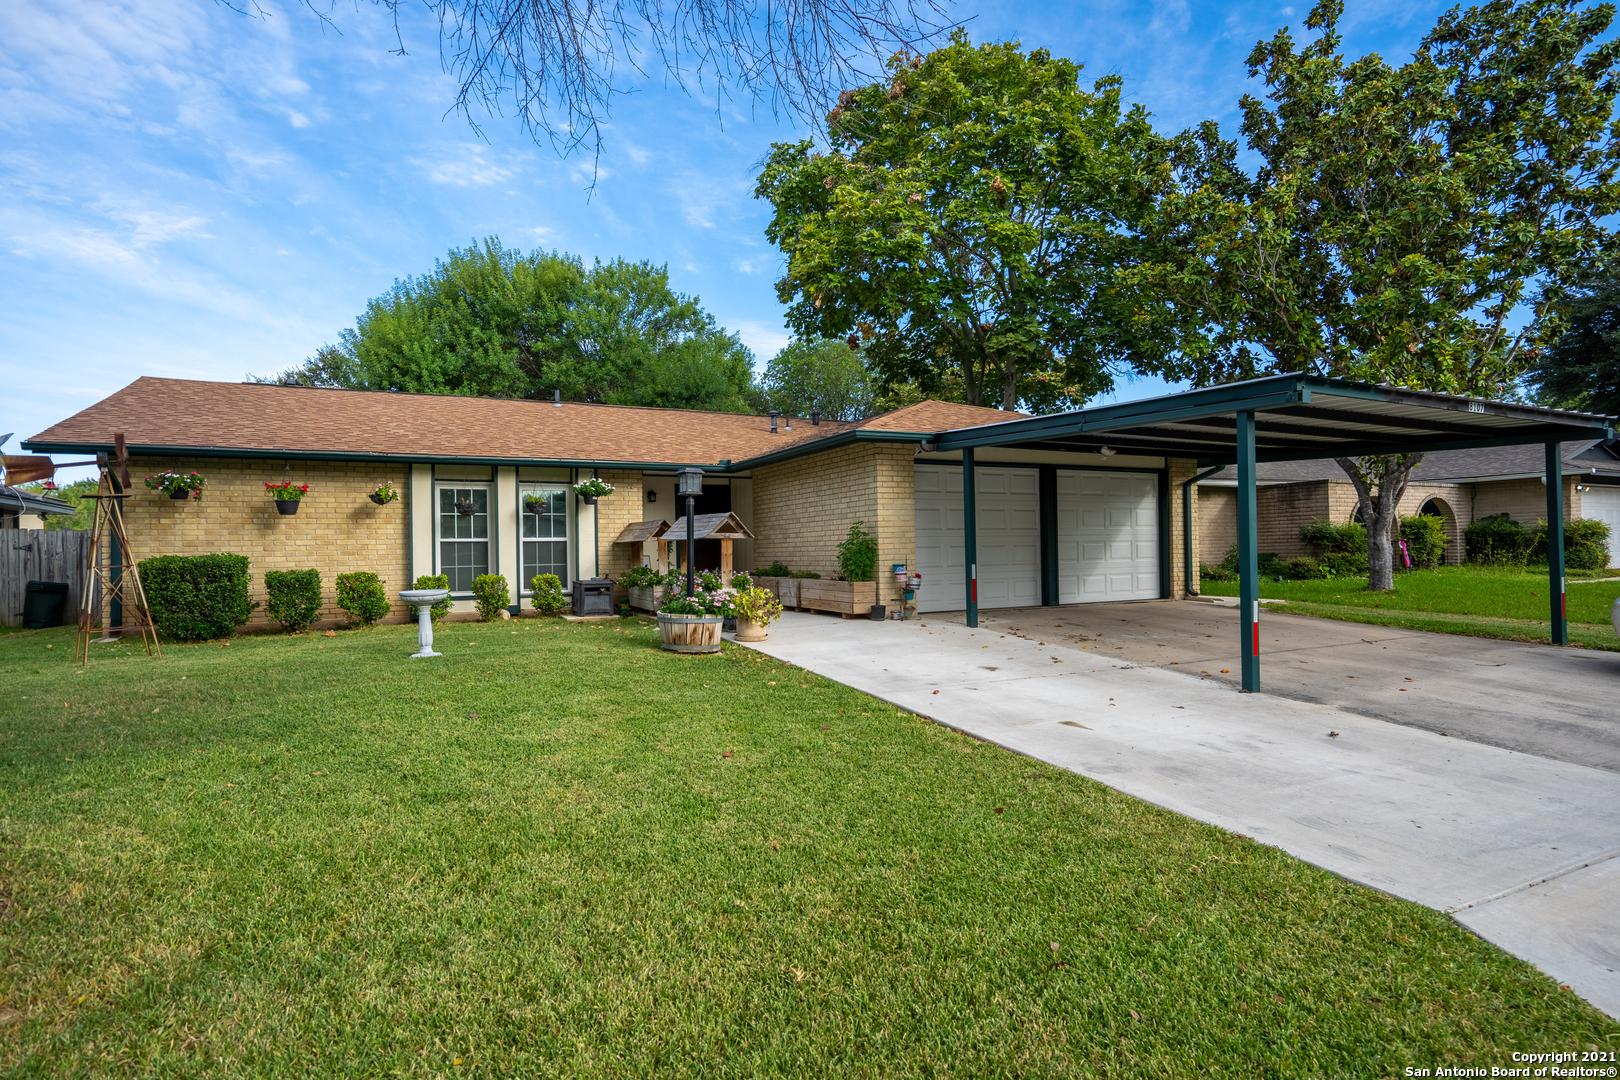 8107 BABE RUTH ST, San Antonio, TX 78240